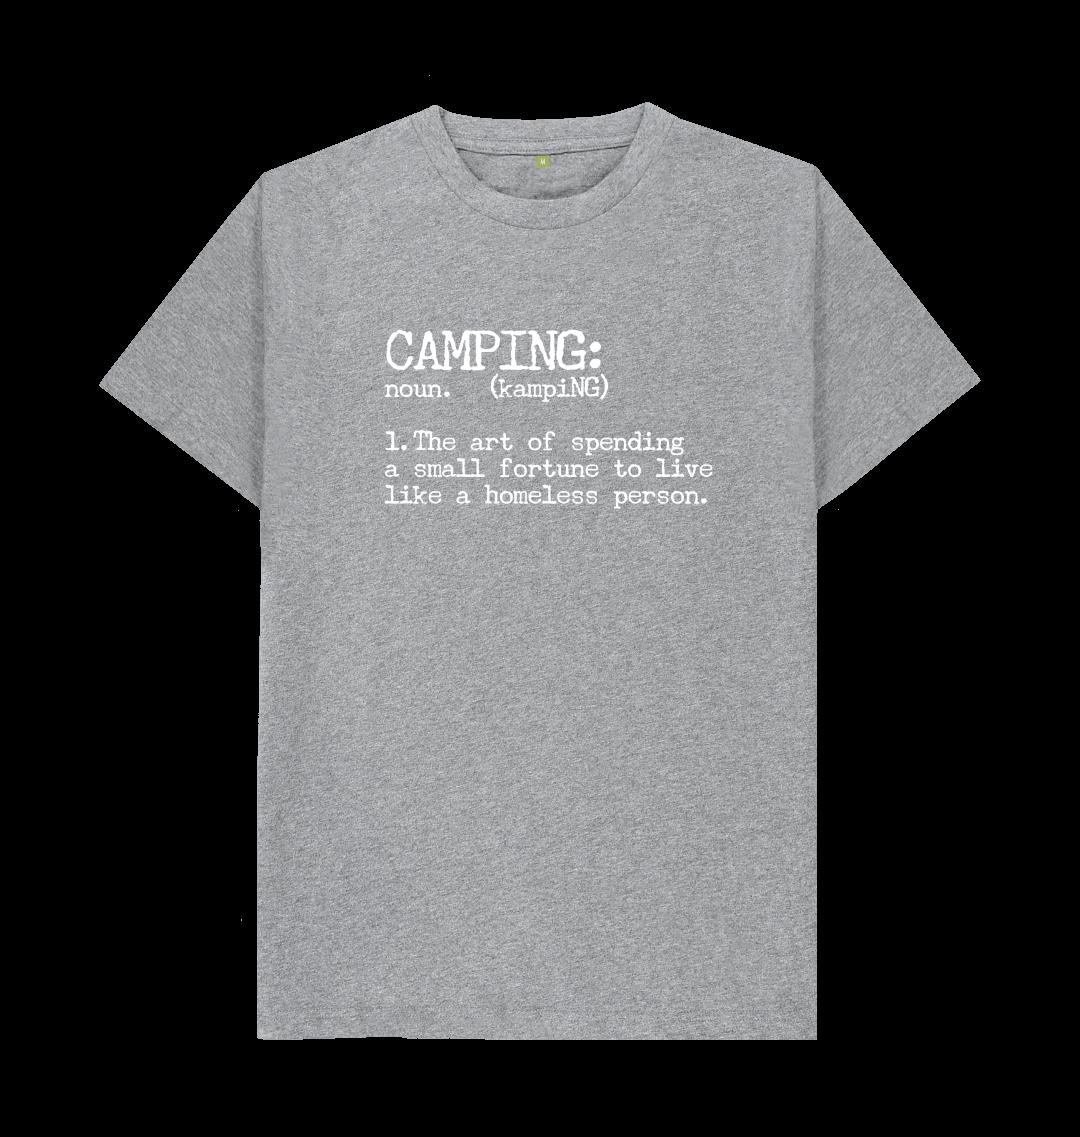 Camping Definition Funny Mens T Shirt Top - Organic Cotton, Vegan grey